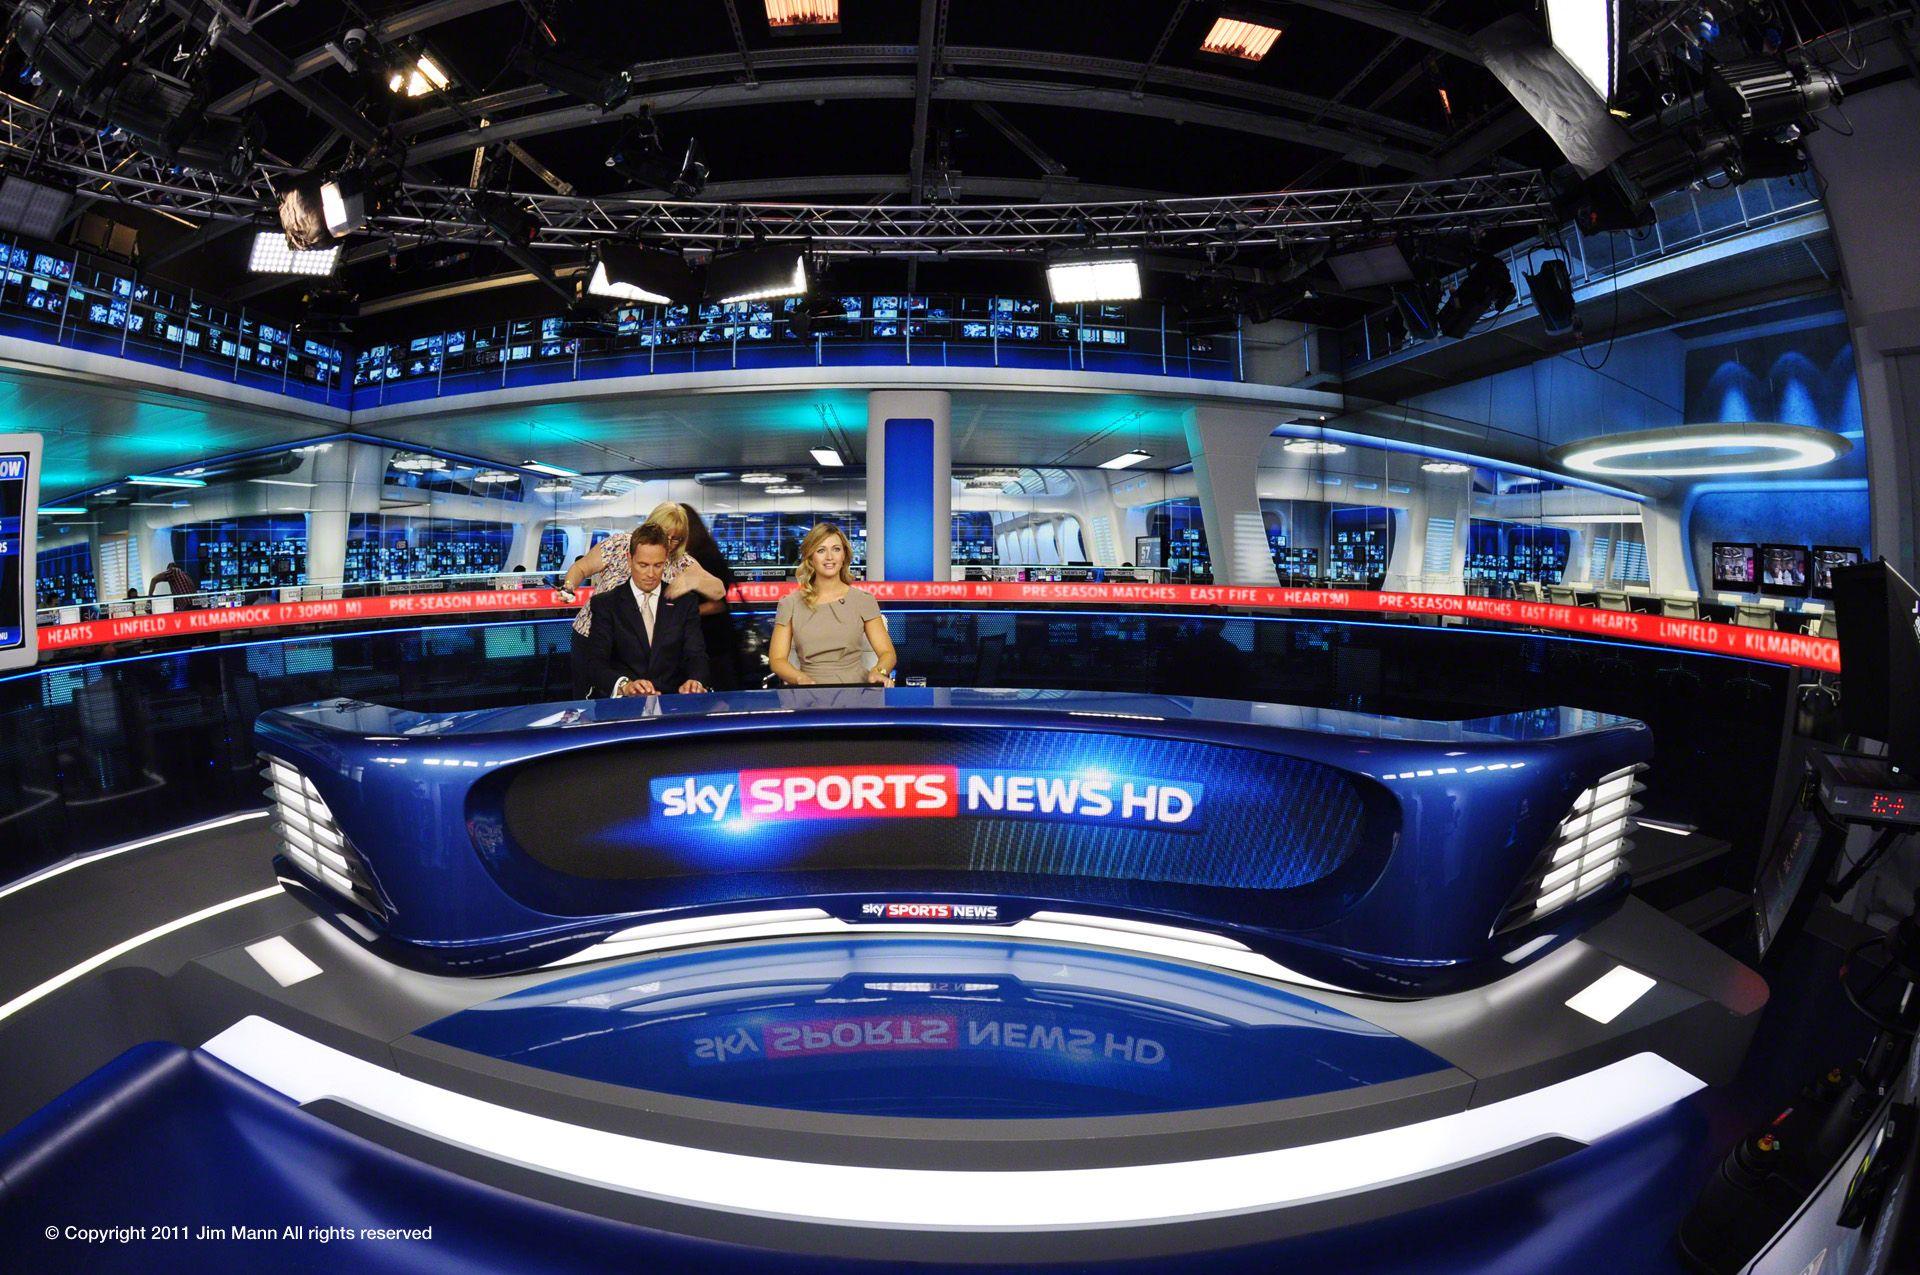 sky-sports-news